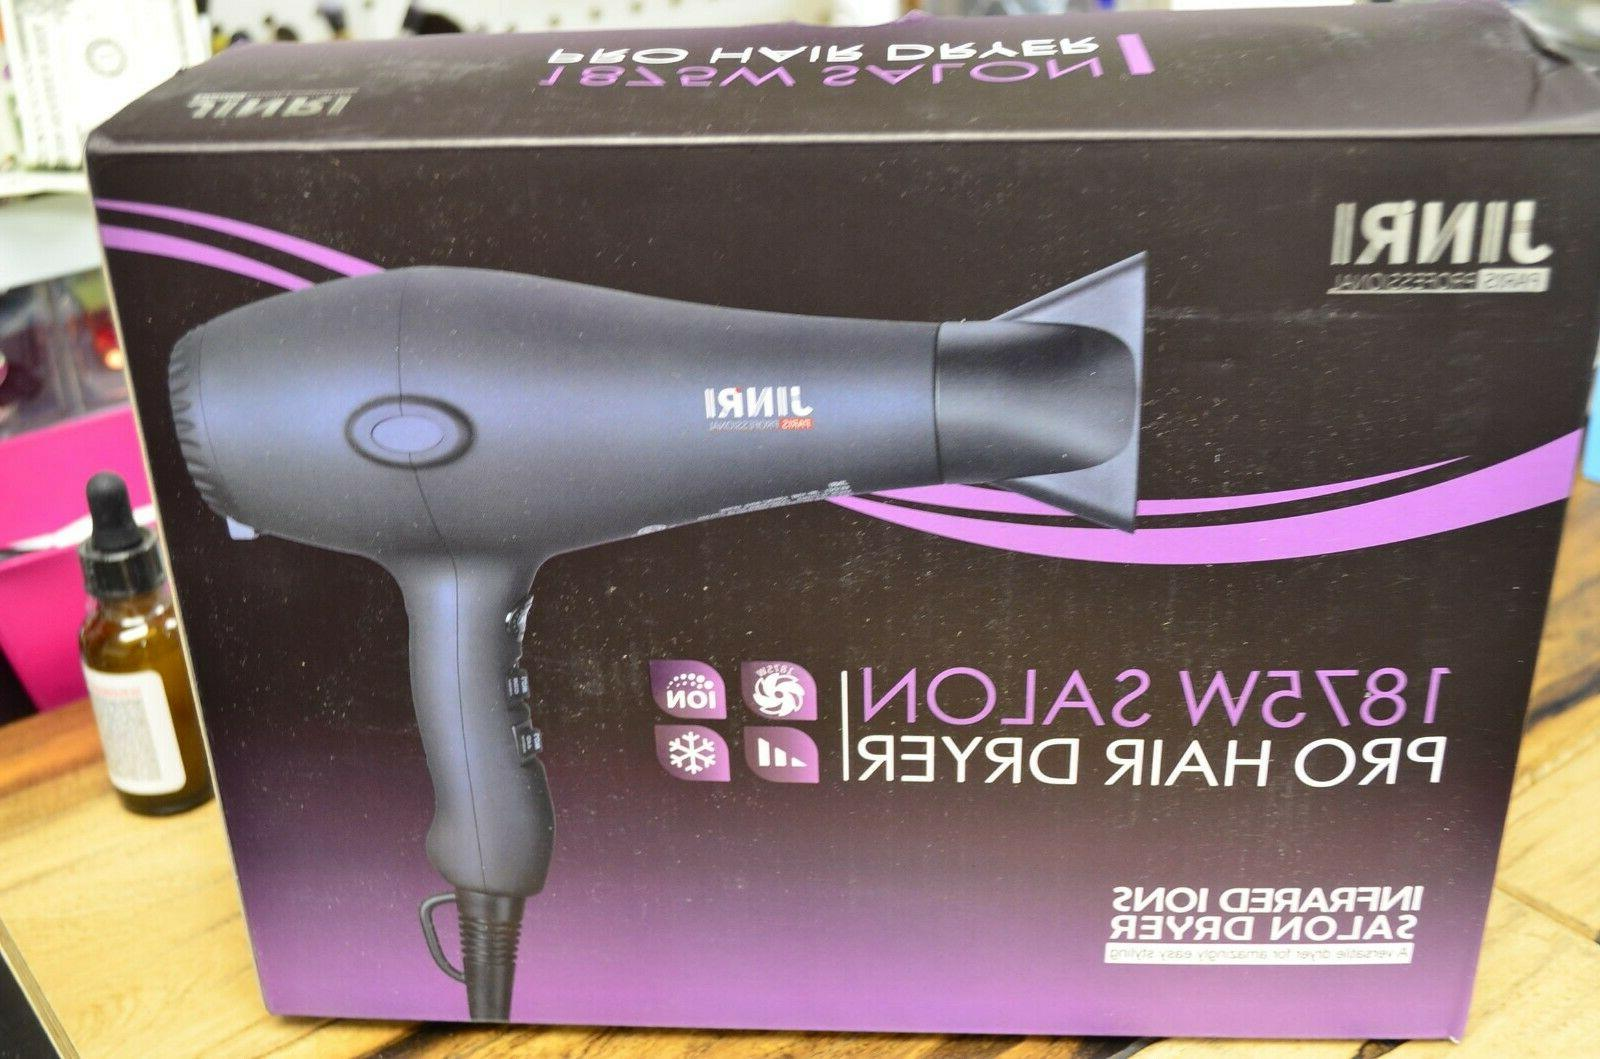 JINRI 1875W Infrared Ions Salon Pro Hair Dryer 2019 Newest M